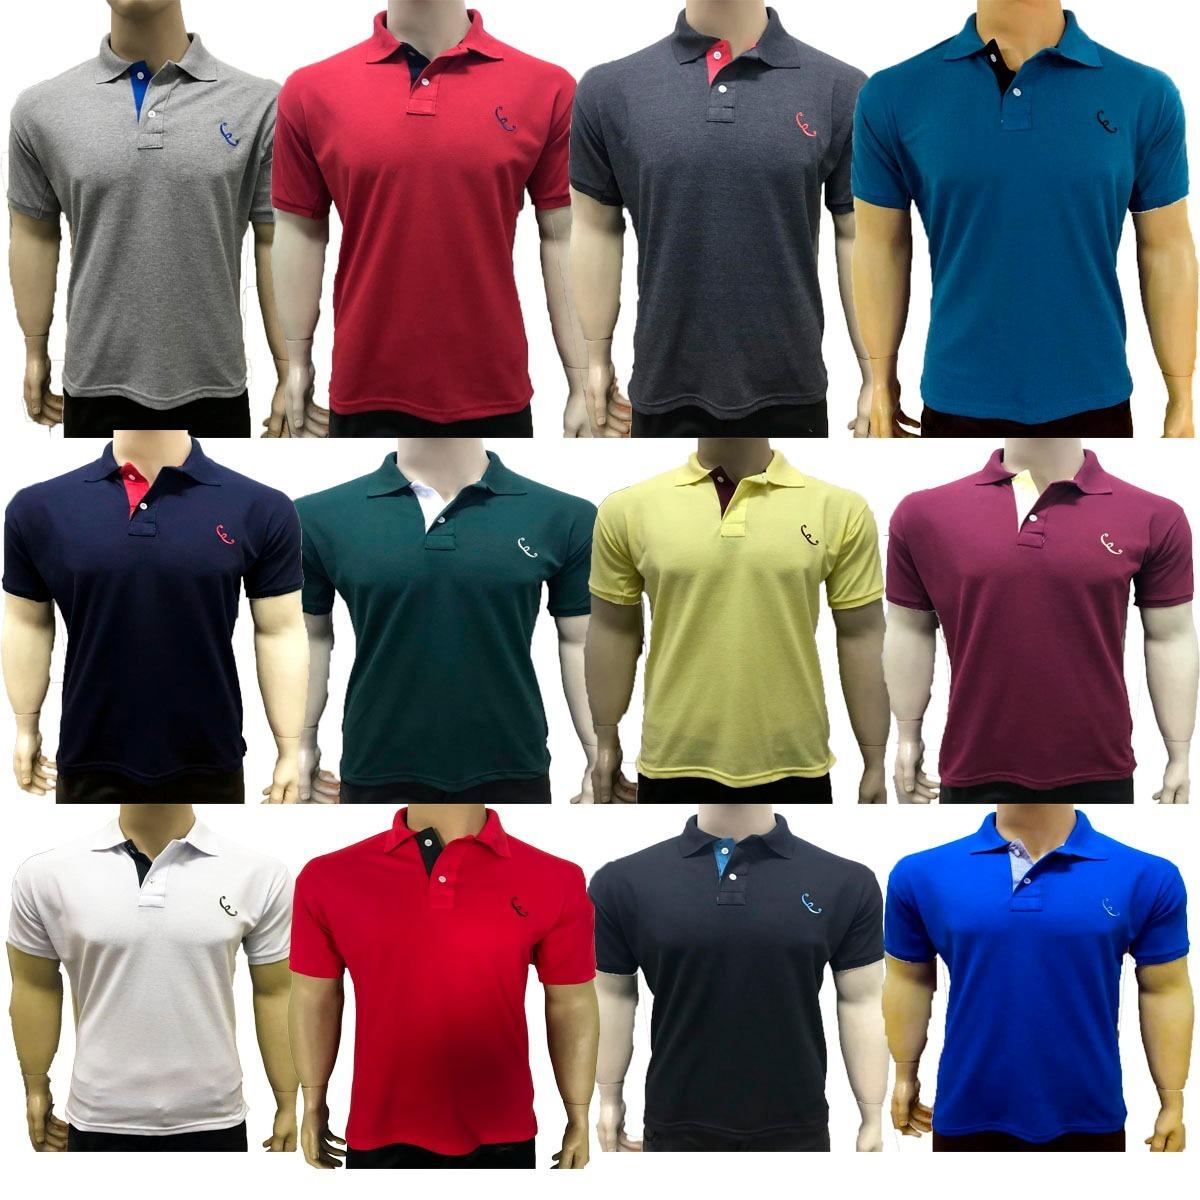 Kit 15 Camiseta Camisa Gola Polo Masculina Revenda Atacado - R  259 ... f5fb42101d8a5